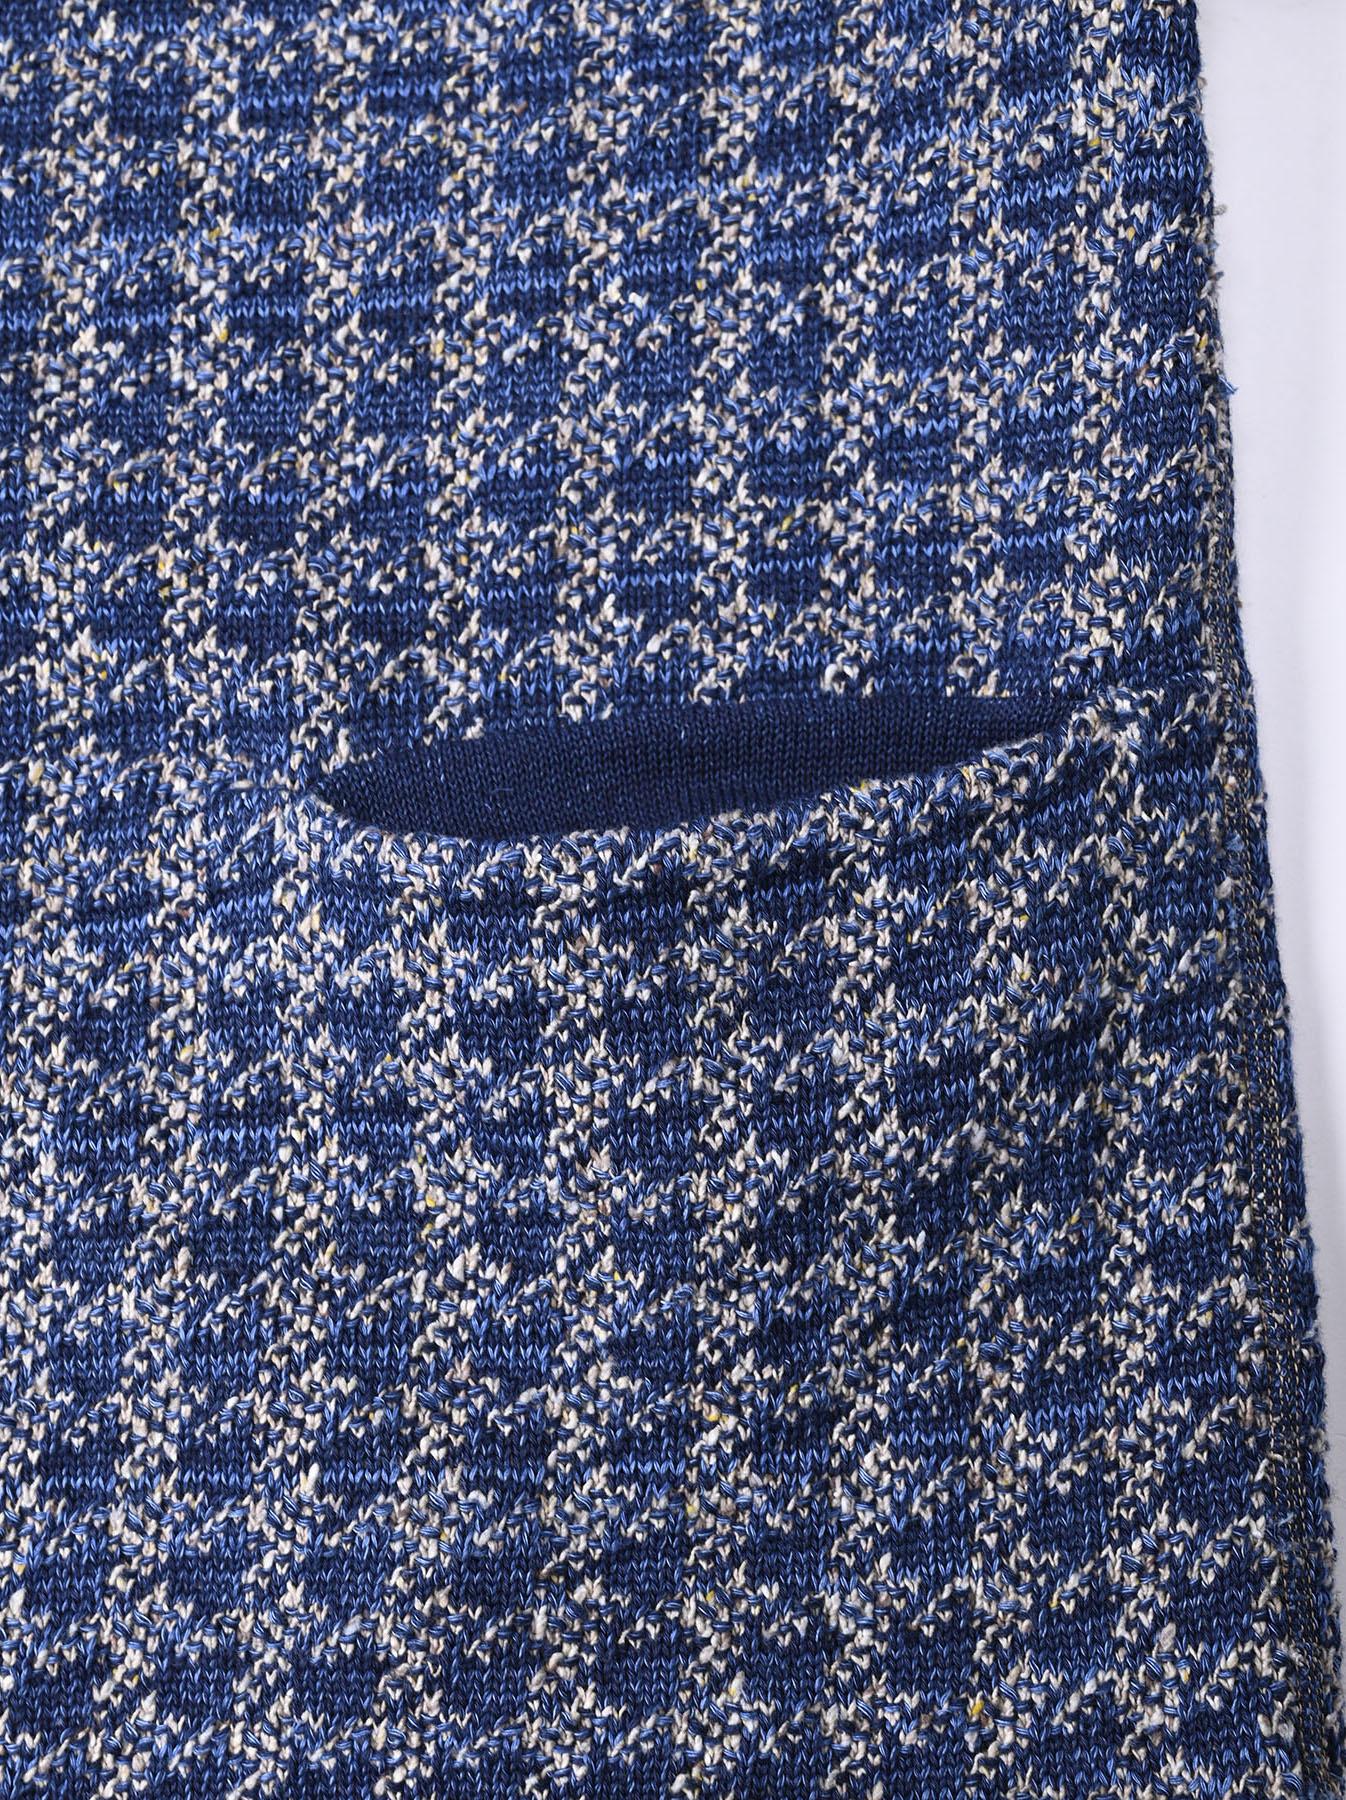 Indigo Knit Jacquard 908 Umahiko Sweater-12